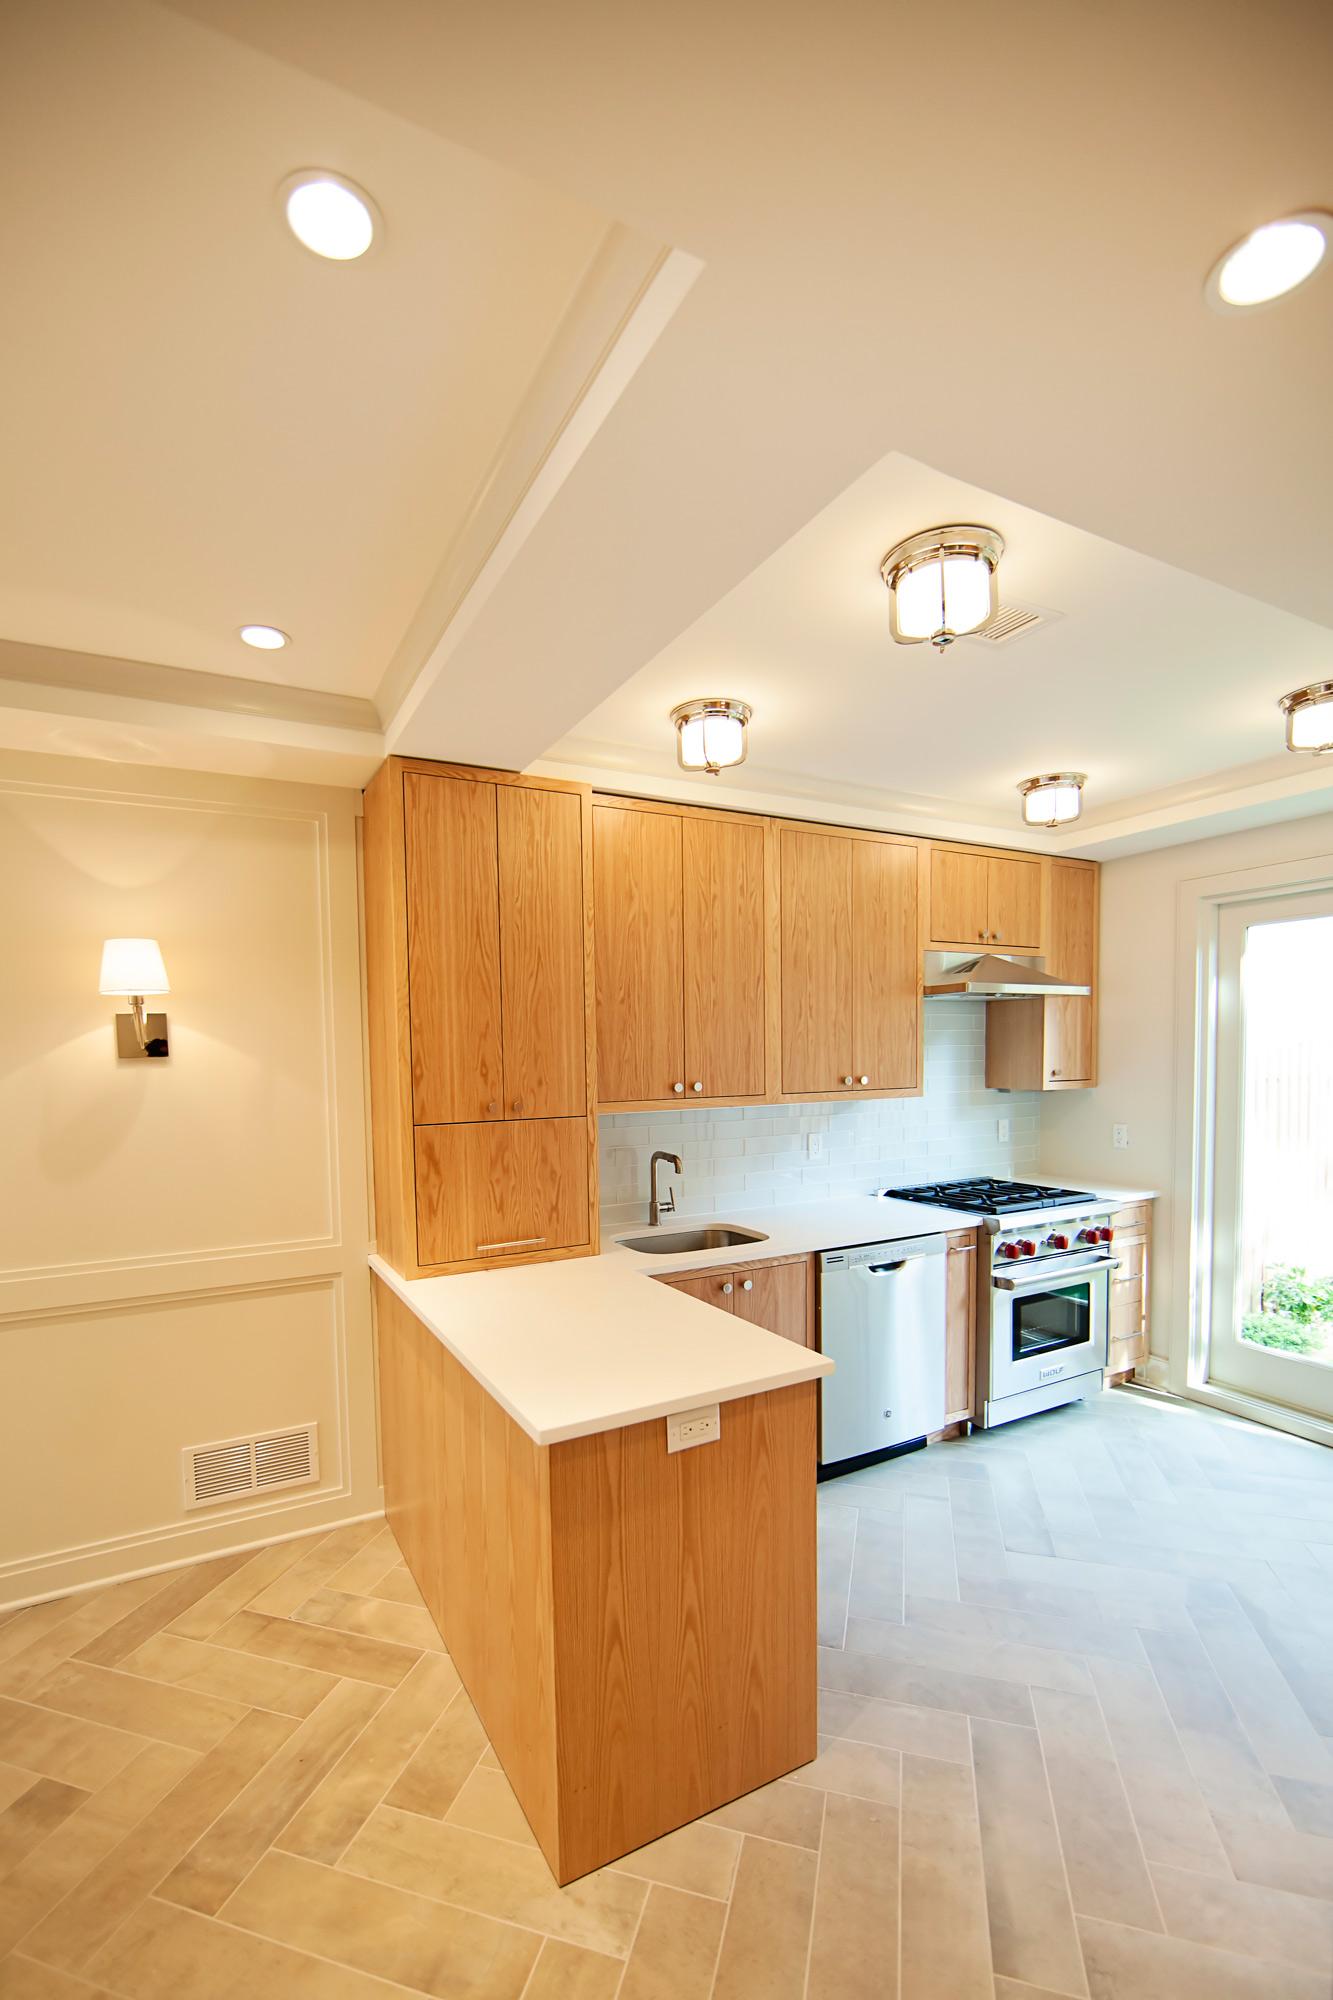 thompson-fine-home-renovations-hoboken-new-jersey-construction-4.jpg